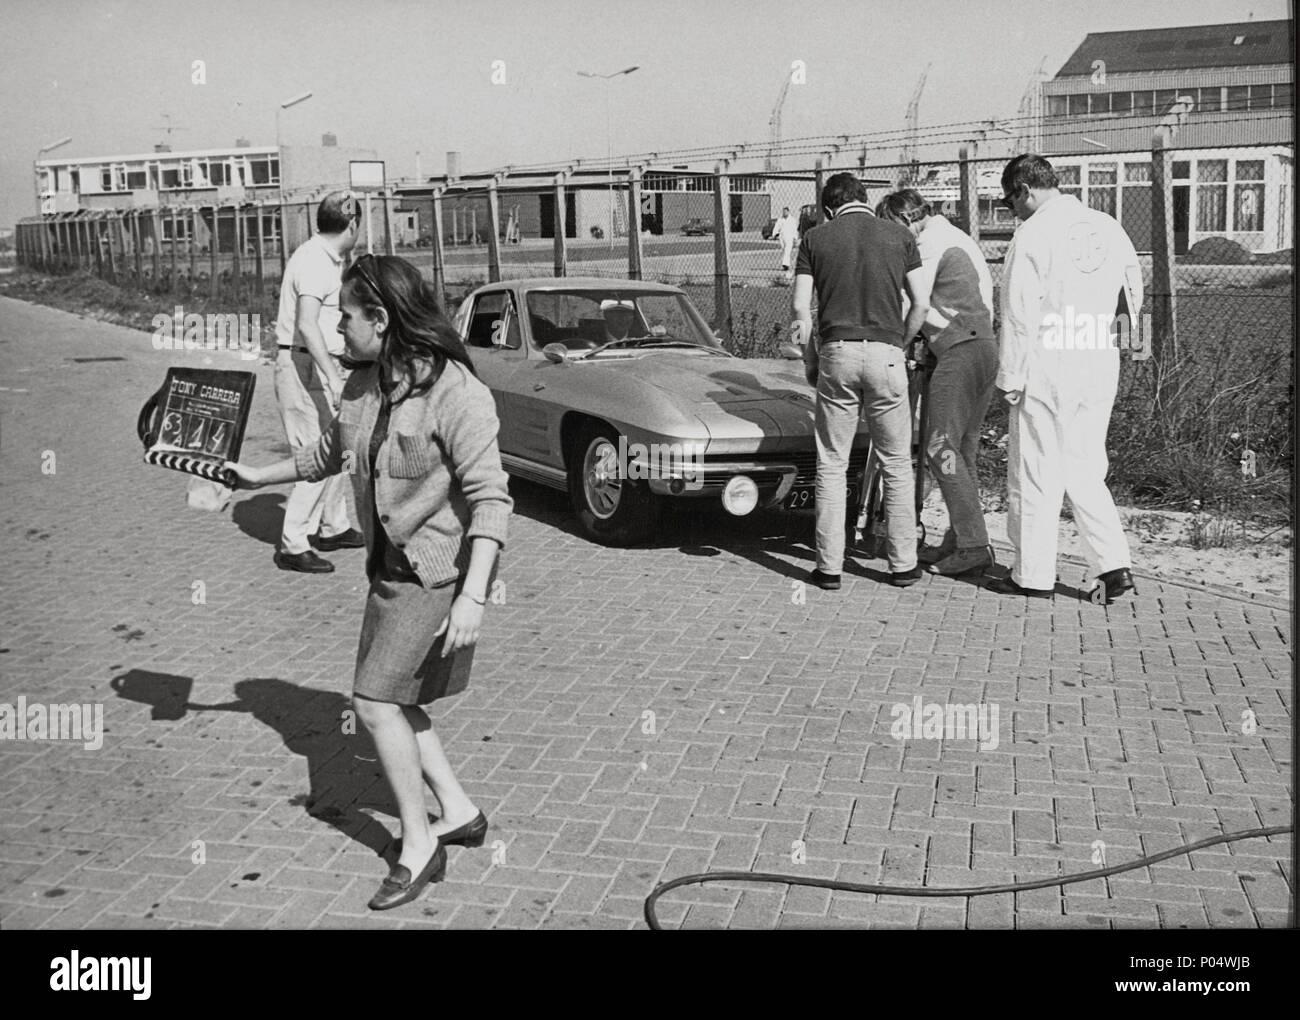 Original Film Title: EL MAGNIFICO TONY CARRERA.  English Title: THE MAGNIFICENT TONY CARRERAS.  Film Director: JOSE ANTONIO DE LA LOMA.  Year: 1968. Stock Photo